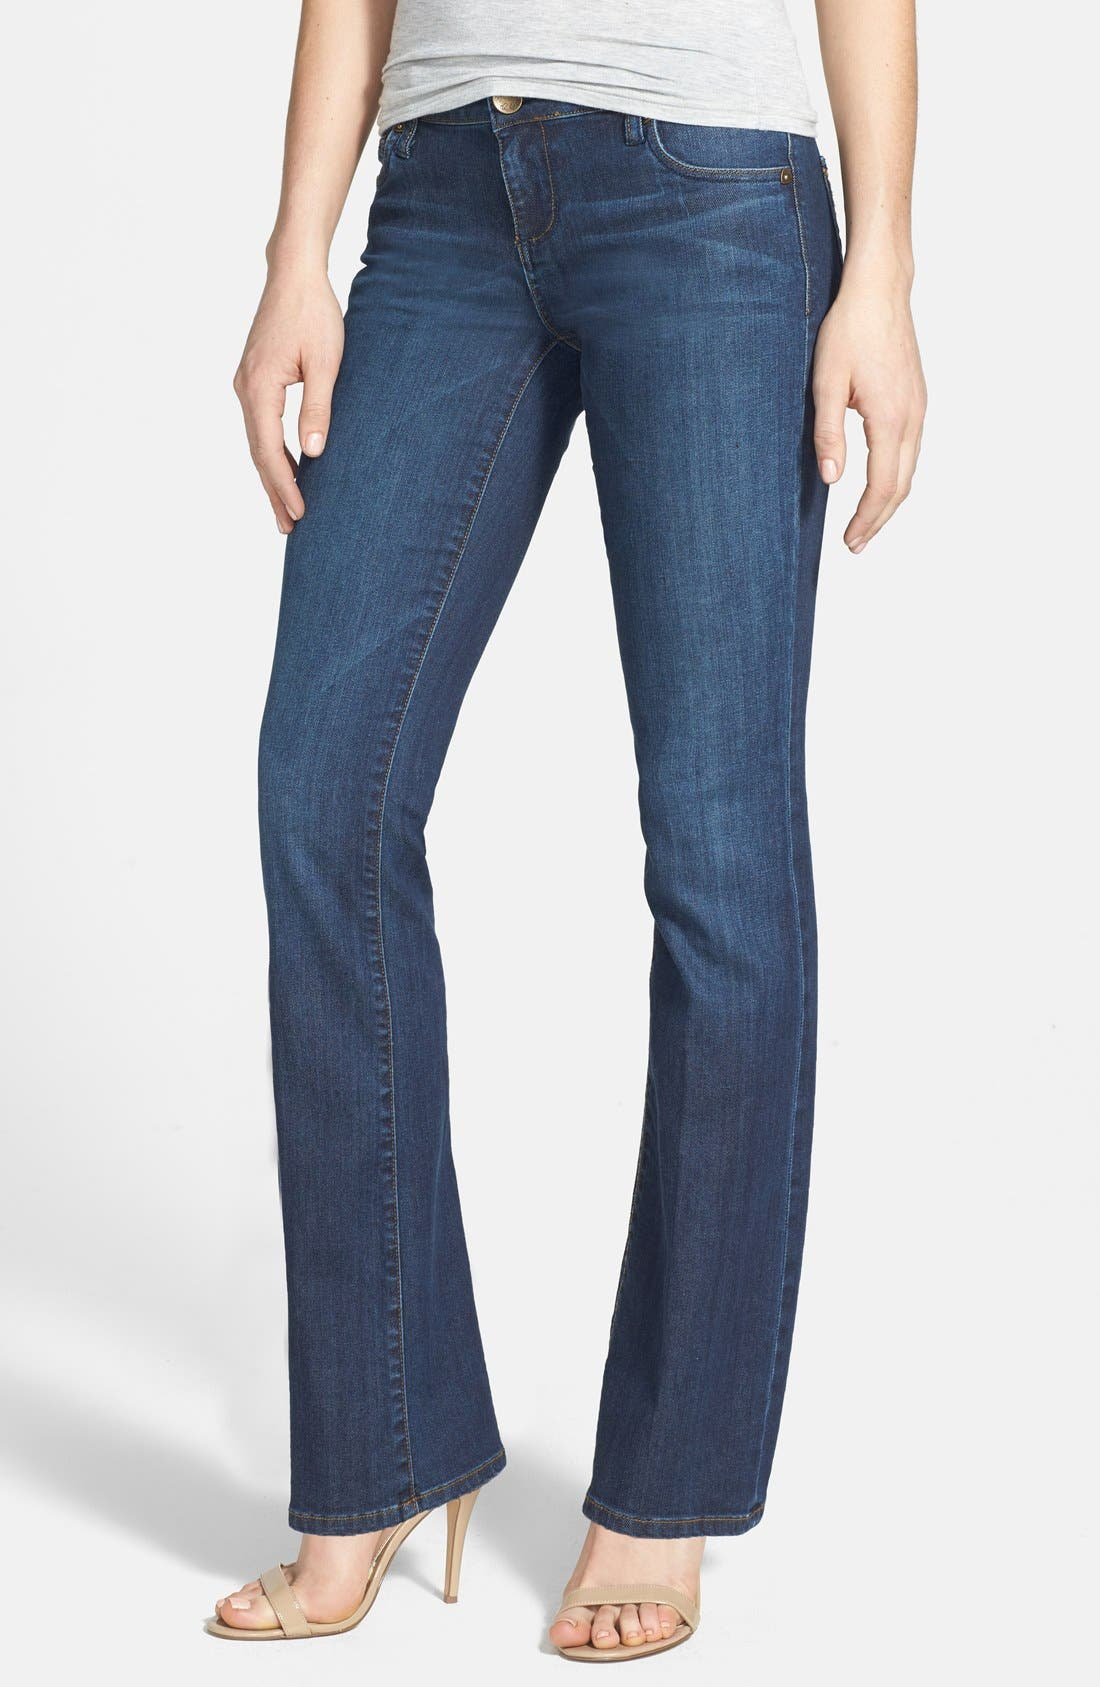 'Farrah' Baby Bootcut Jeans,                             Main thumbnail 1, color,                             400